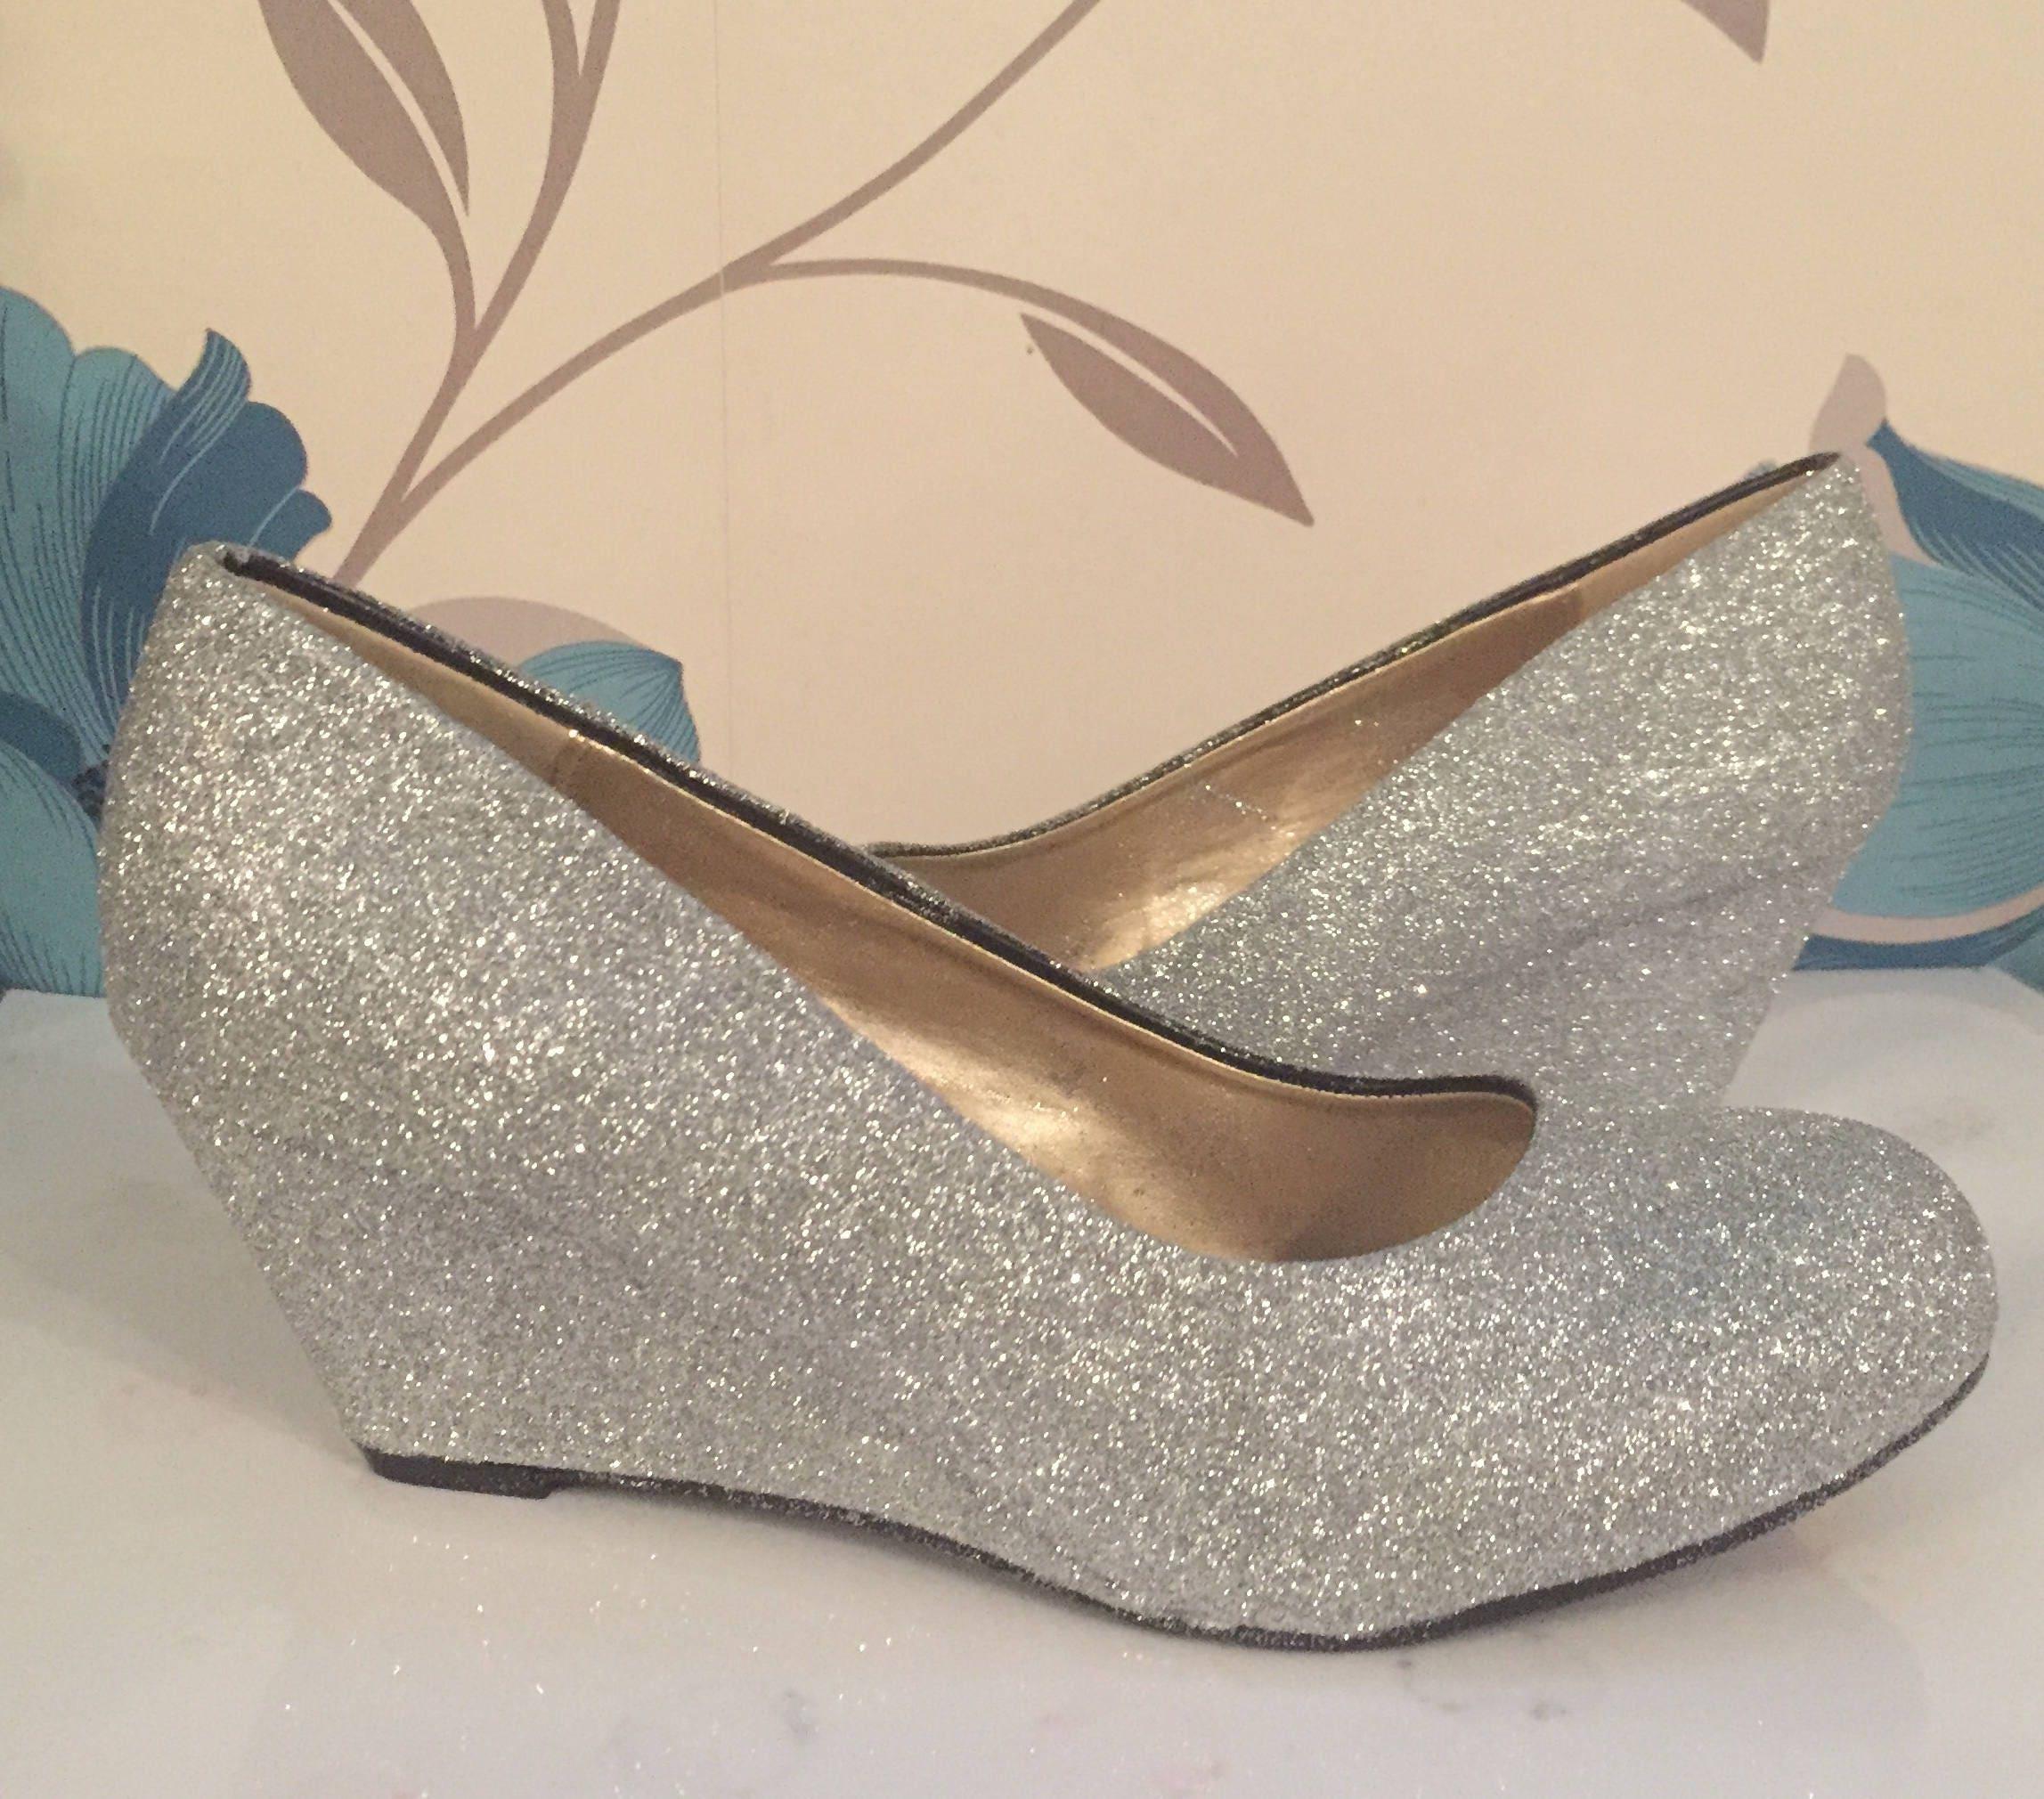 Custom Made Bridal Shoes Uk: Silver Glitter Wedges Silver Bridal Shoes Bridesmaid